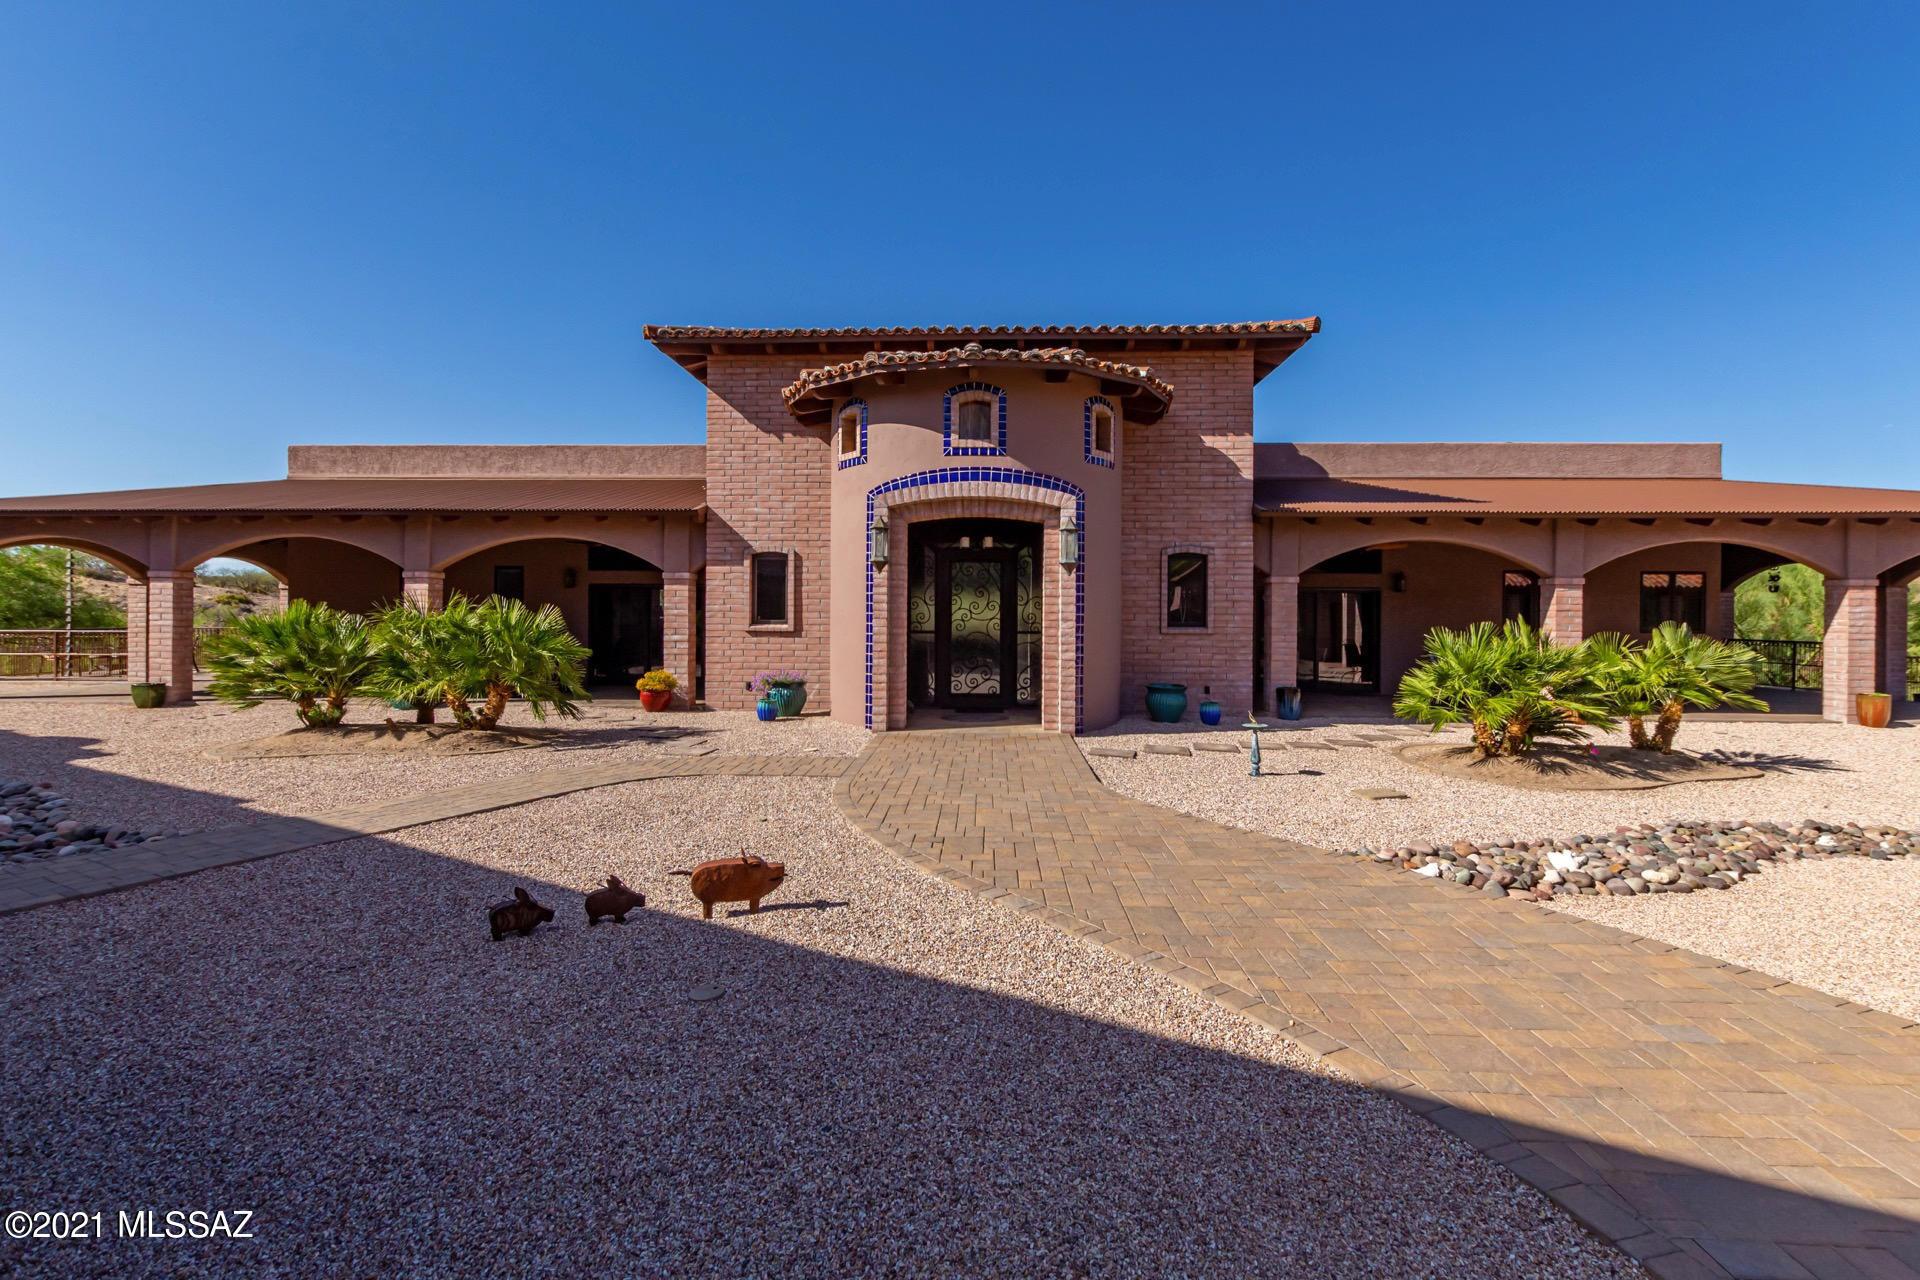 Photo of 130 Canyon Pass Court, Tubac, AZ 85646